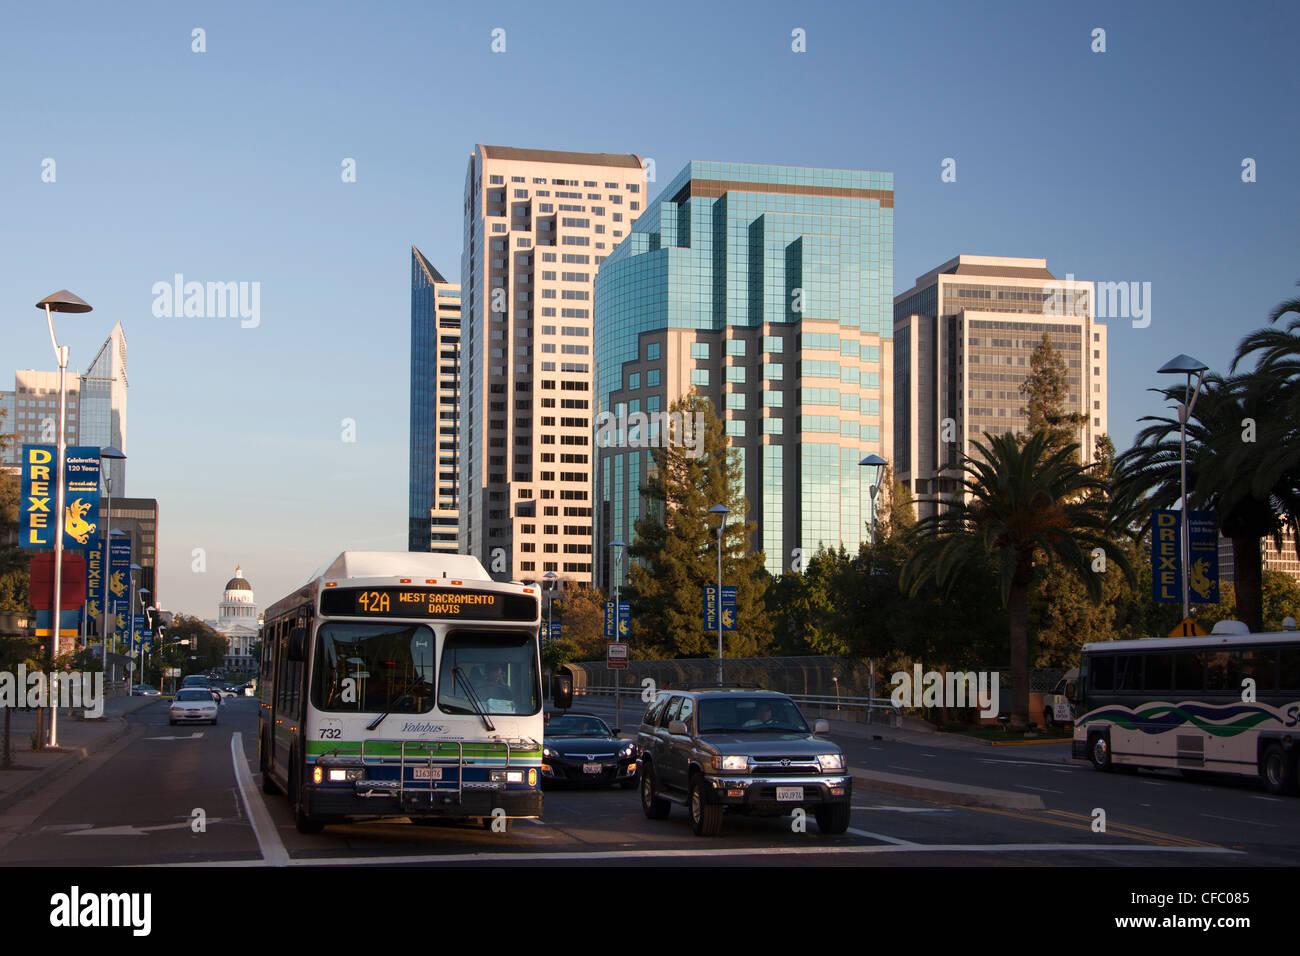 USA, United States, America, California, Sacramento, City, Capitol Mall, bus, capitol, skyline, touristic - Stock Image